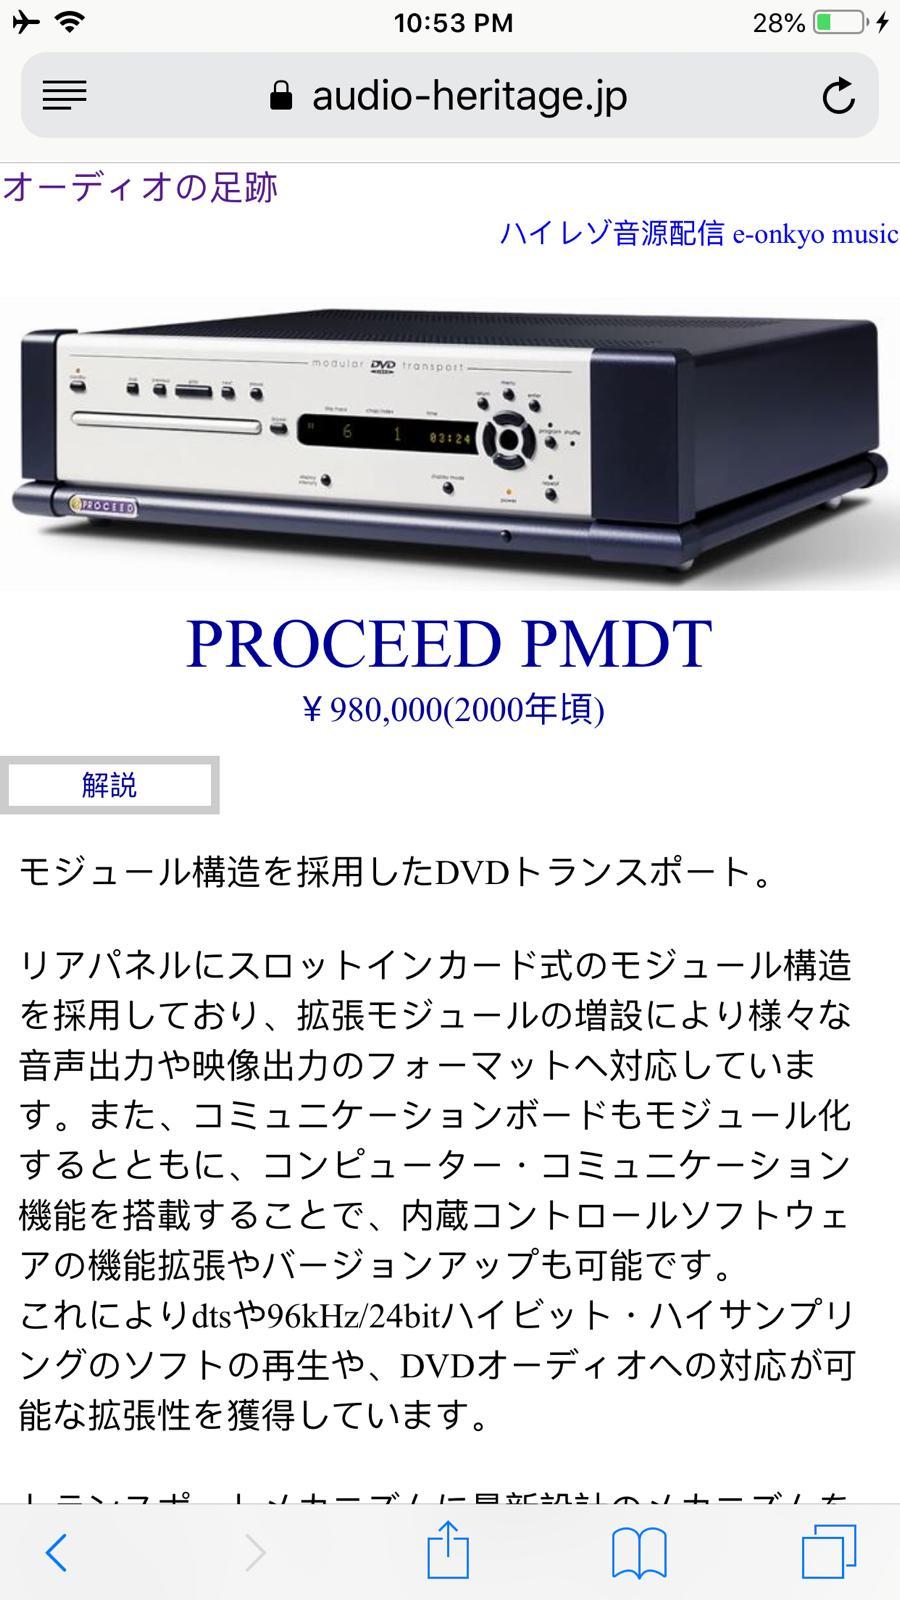 PROCEED PMDT Transport  34fae210